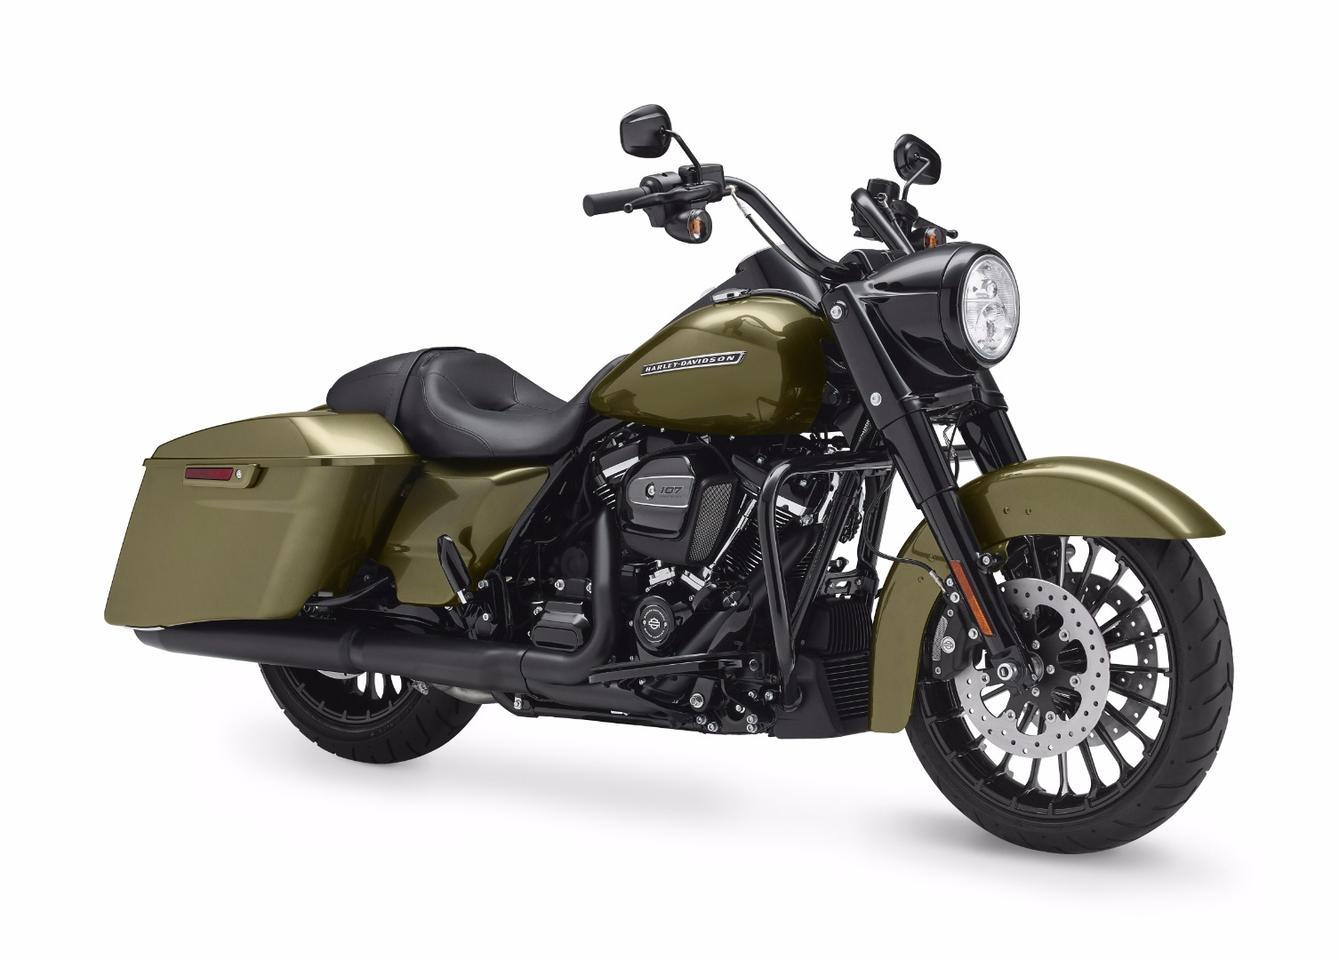 The 2017 Harley-Davidson Road King Special in olive gold color